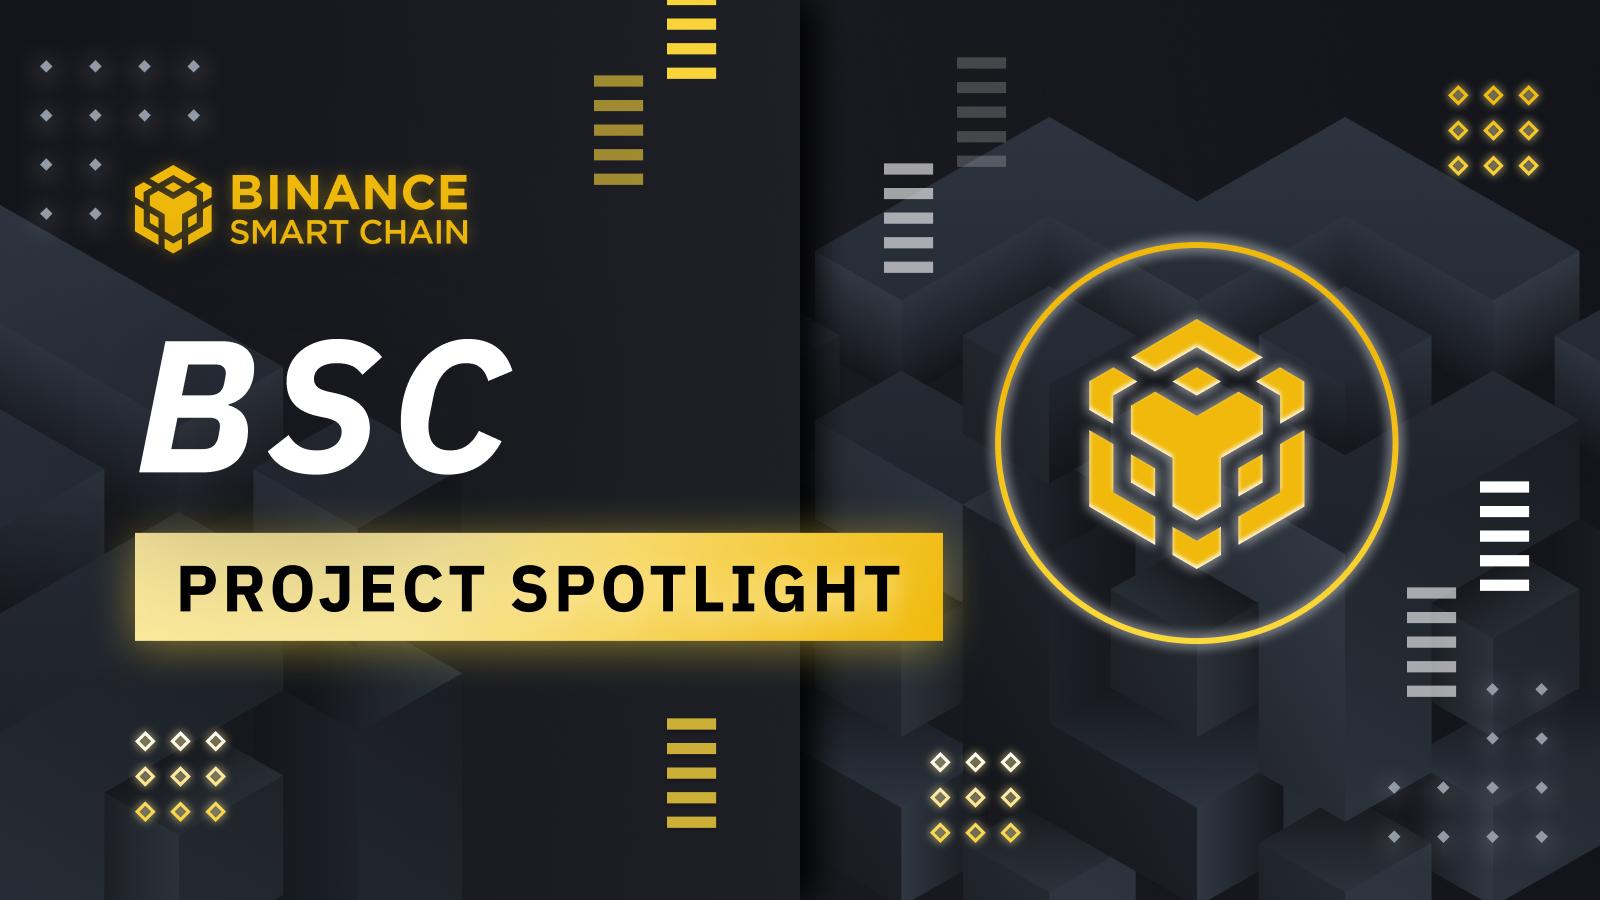 BSC Project Spotlight: Featured by Binance